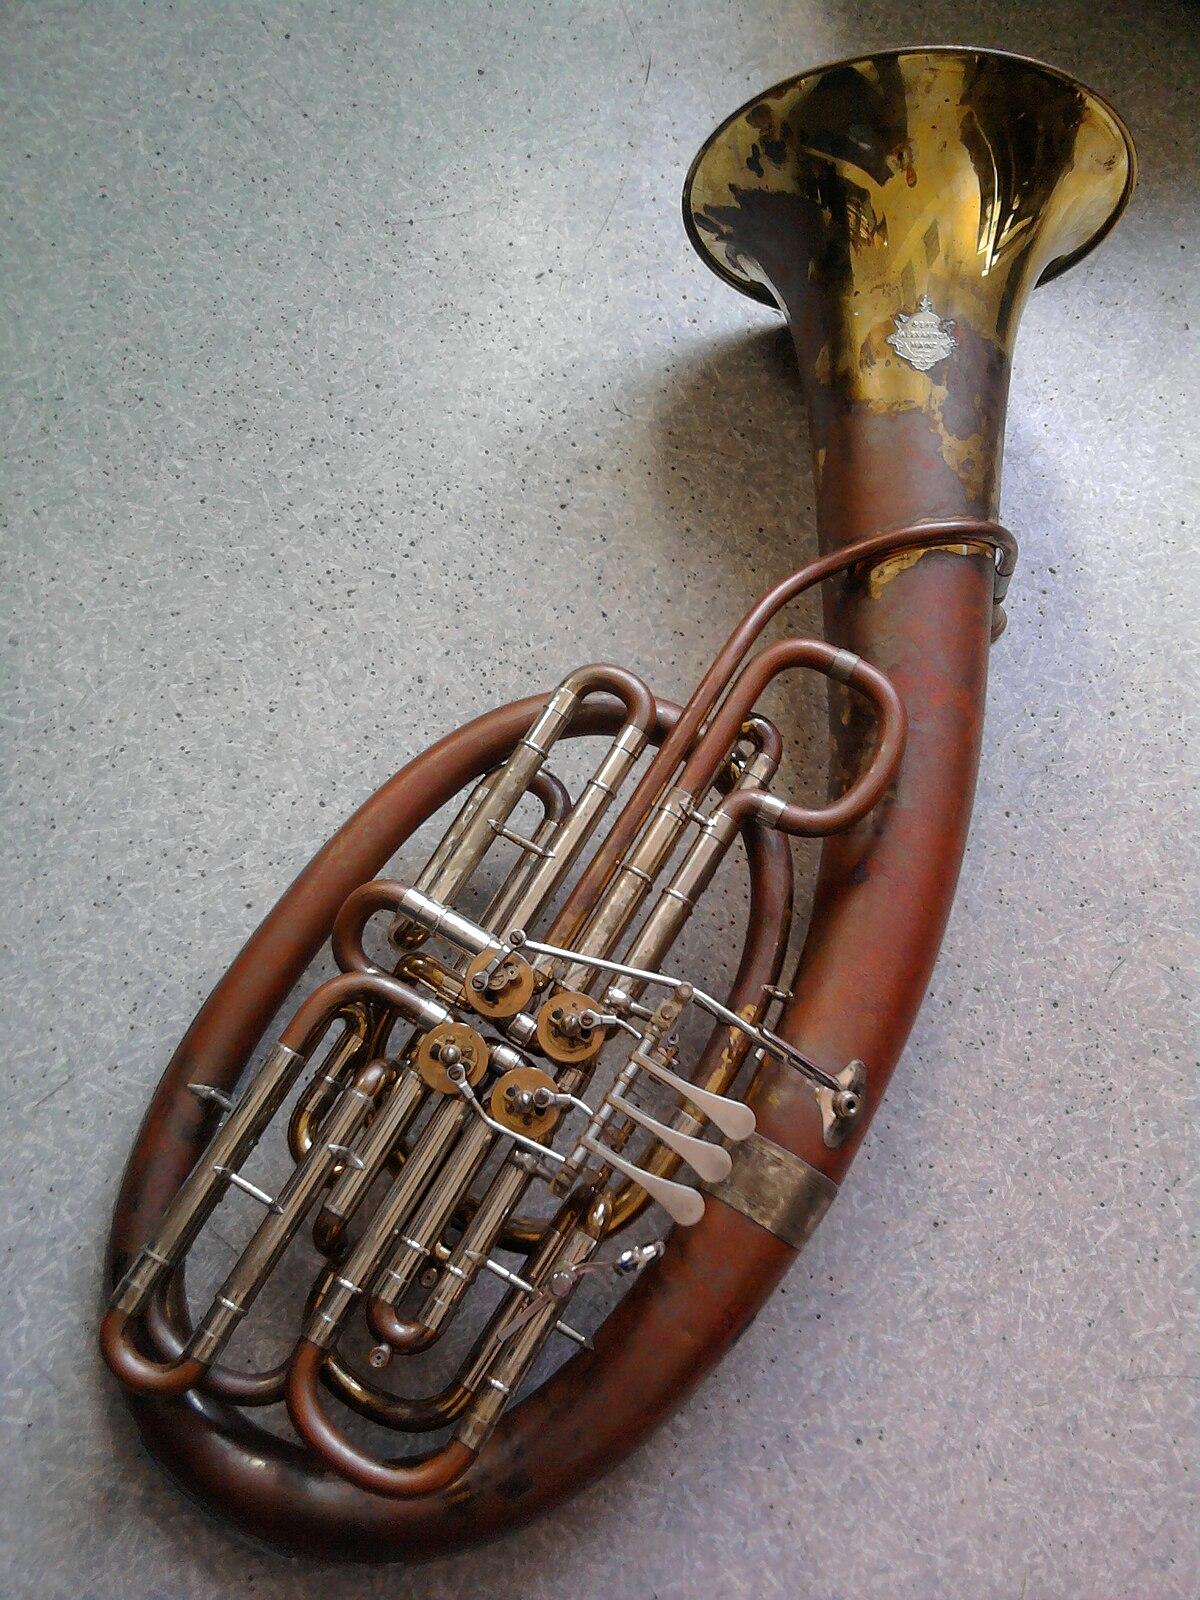 Wagner tuba - Wikipedia